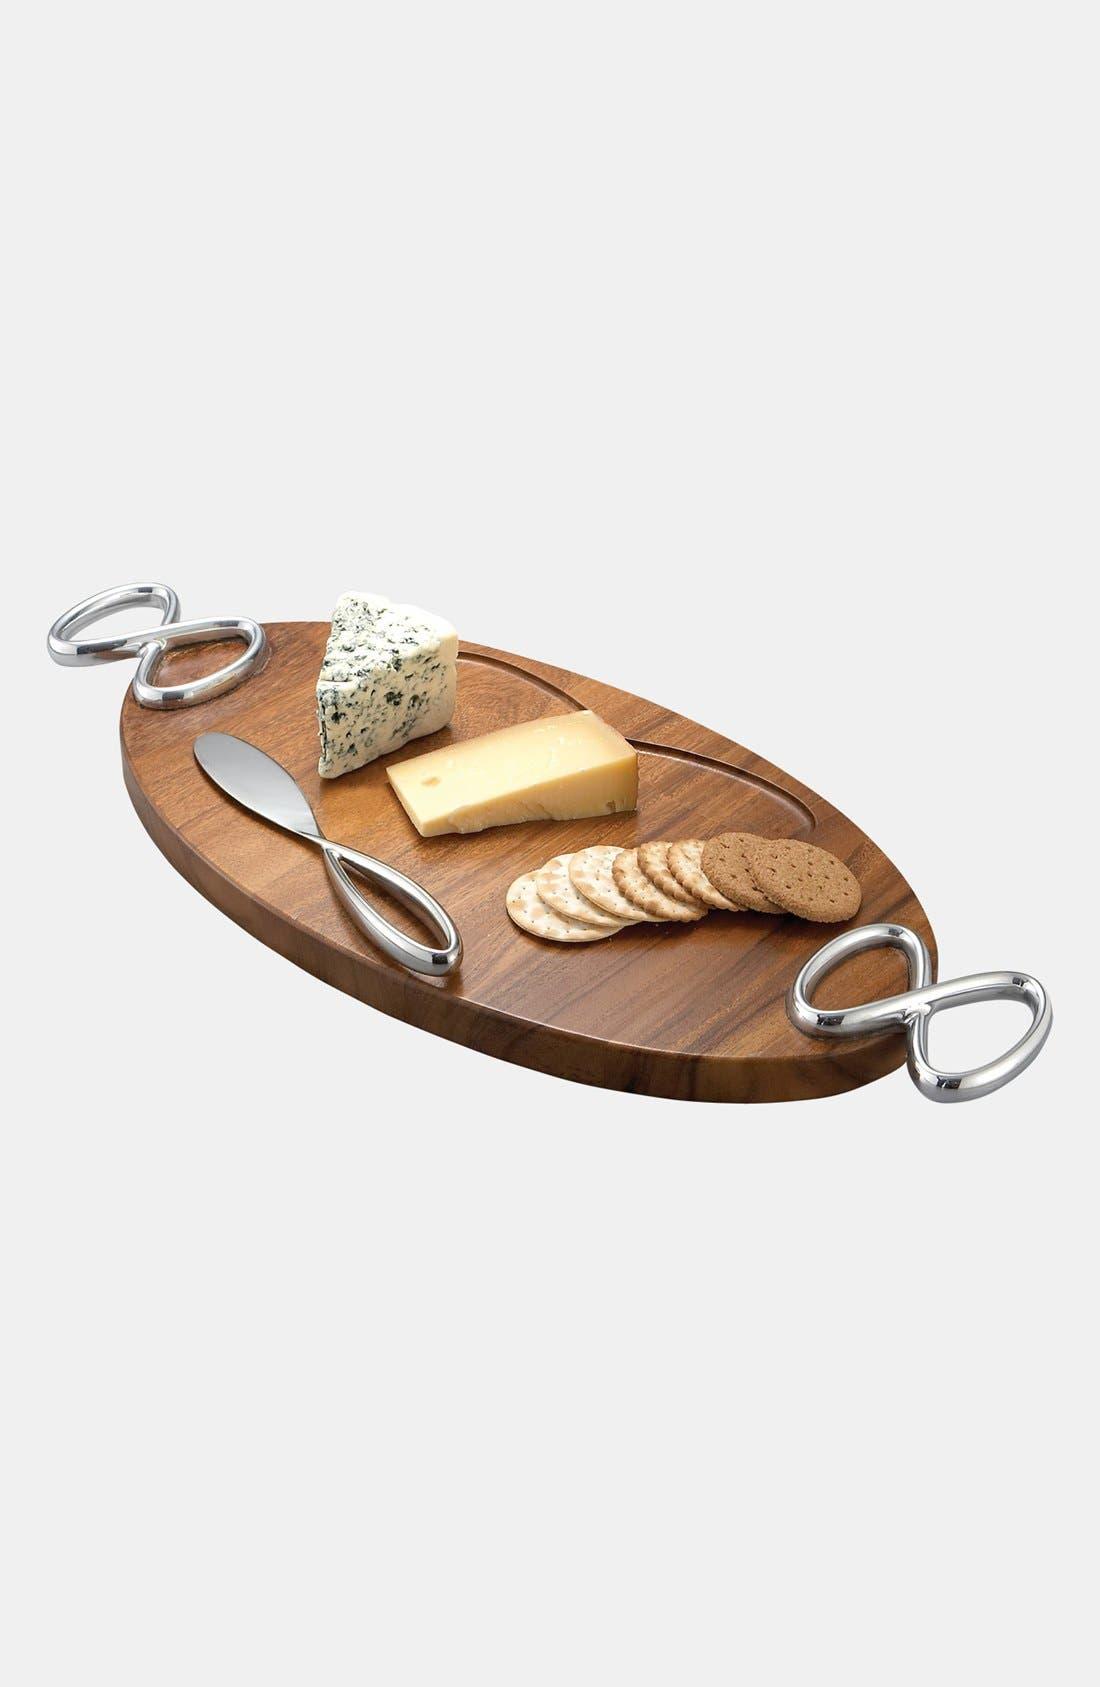 Nambé Infinity Cheese Board & Knife